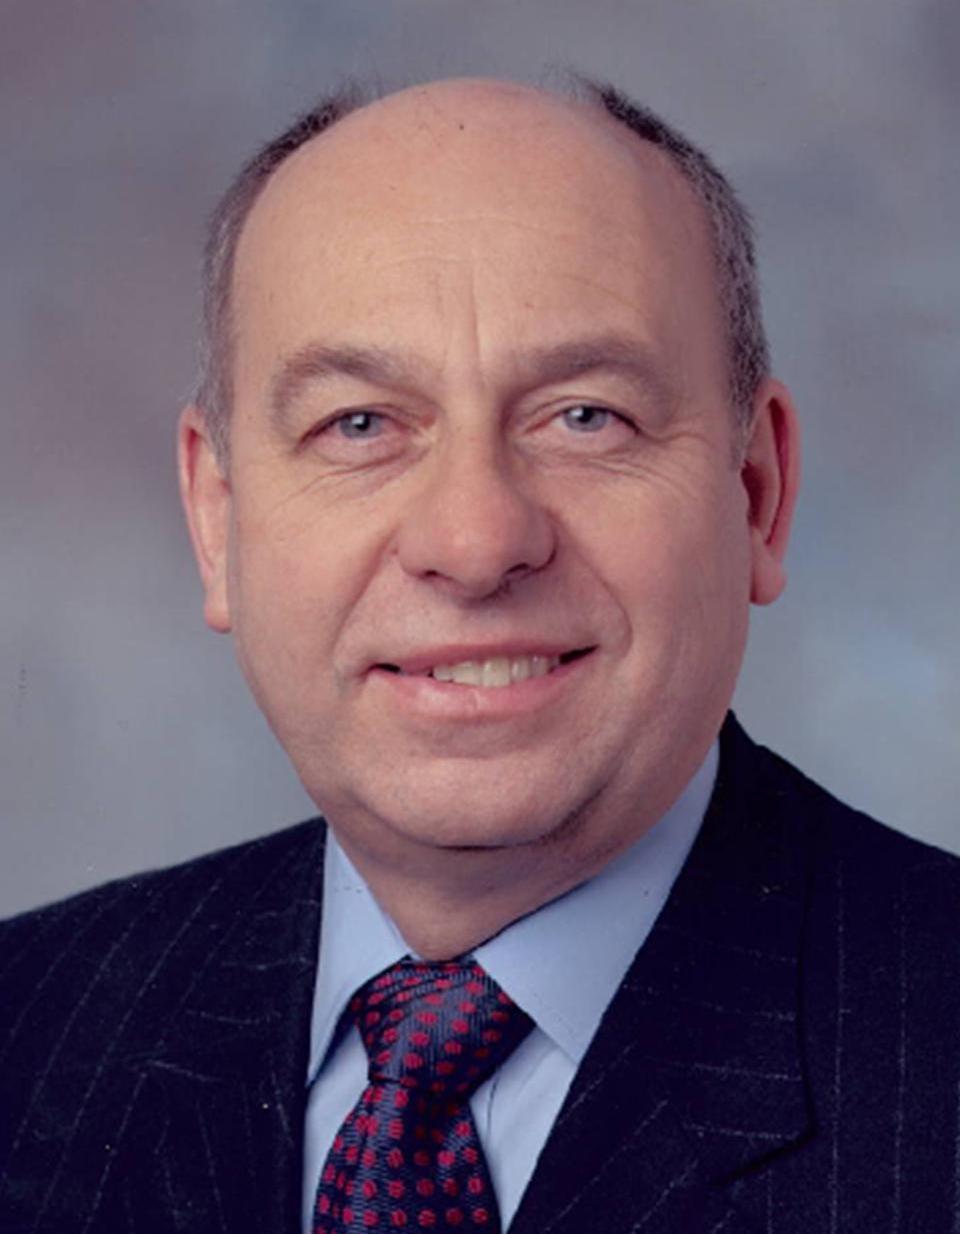 Joe Greenwell, Chairman, Ford of Britain